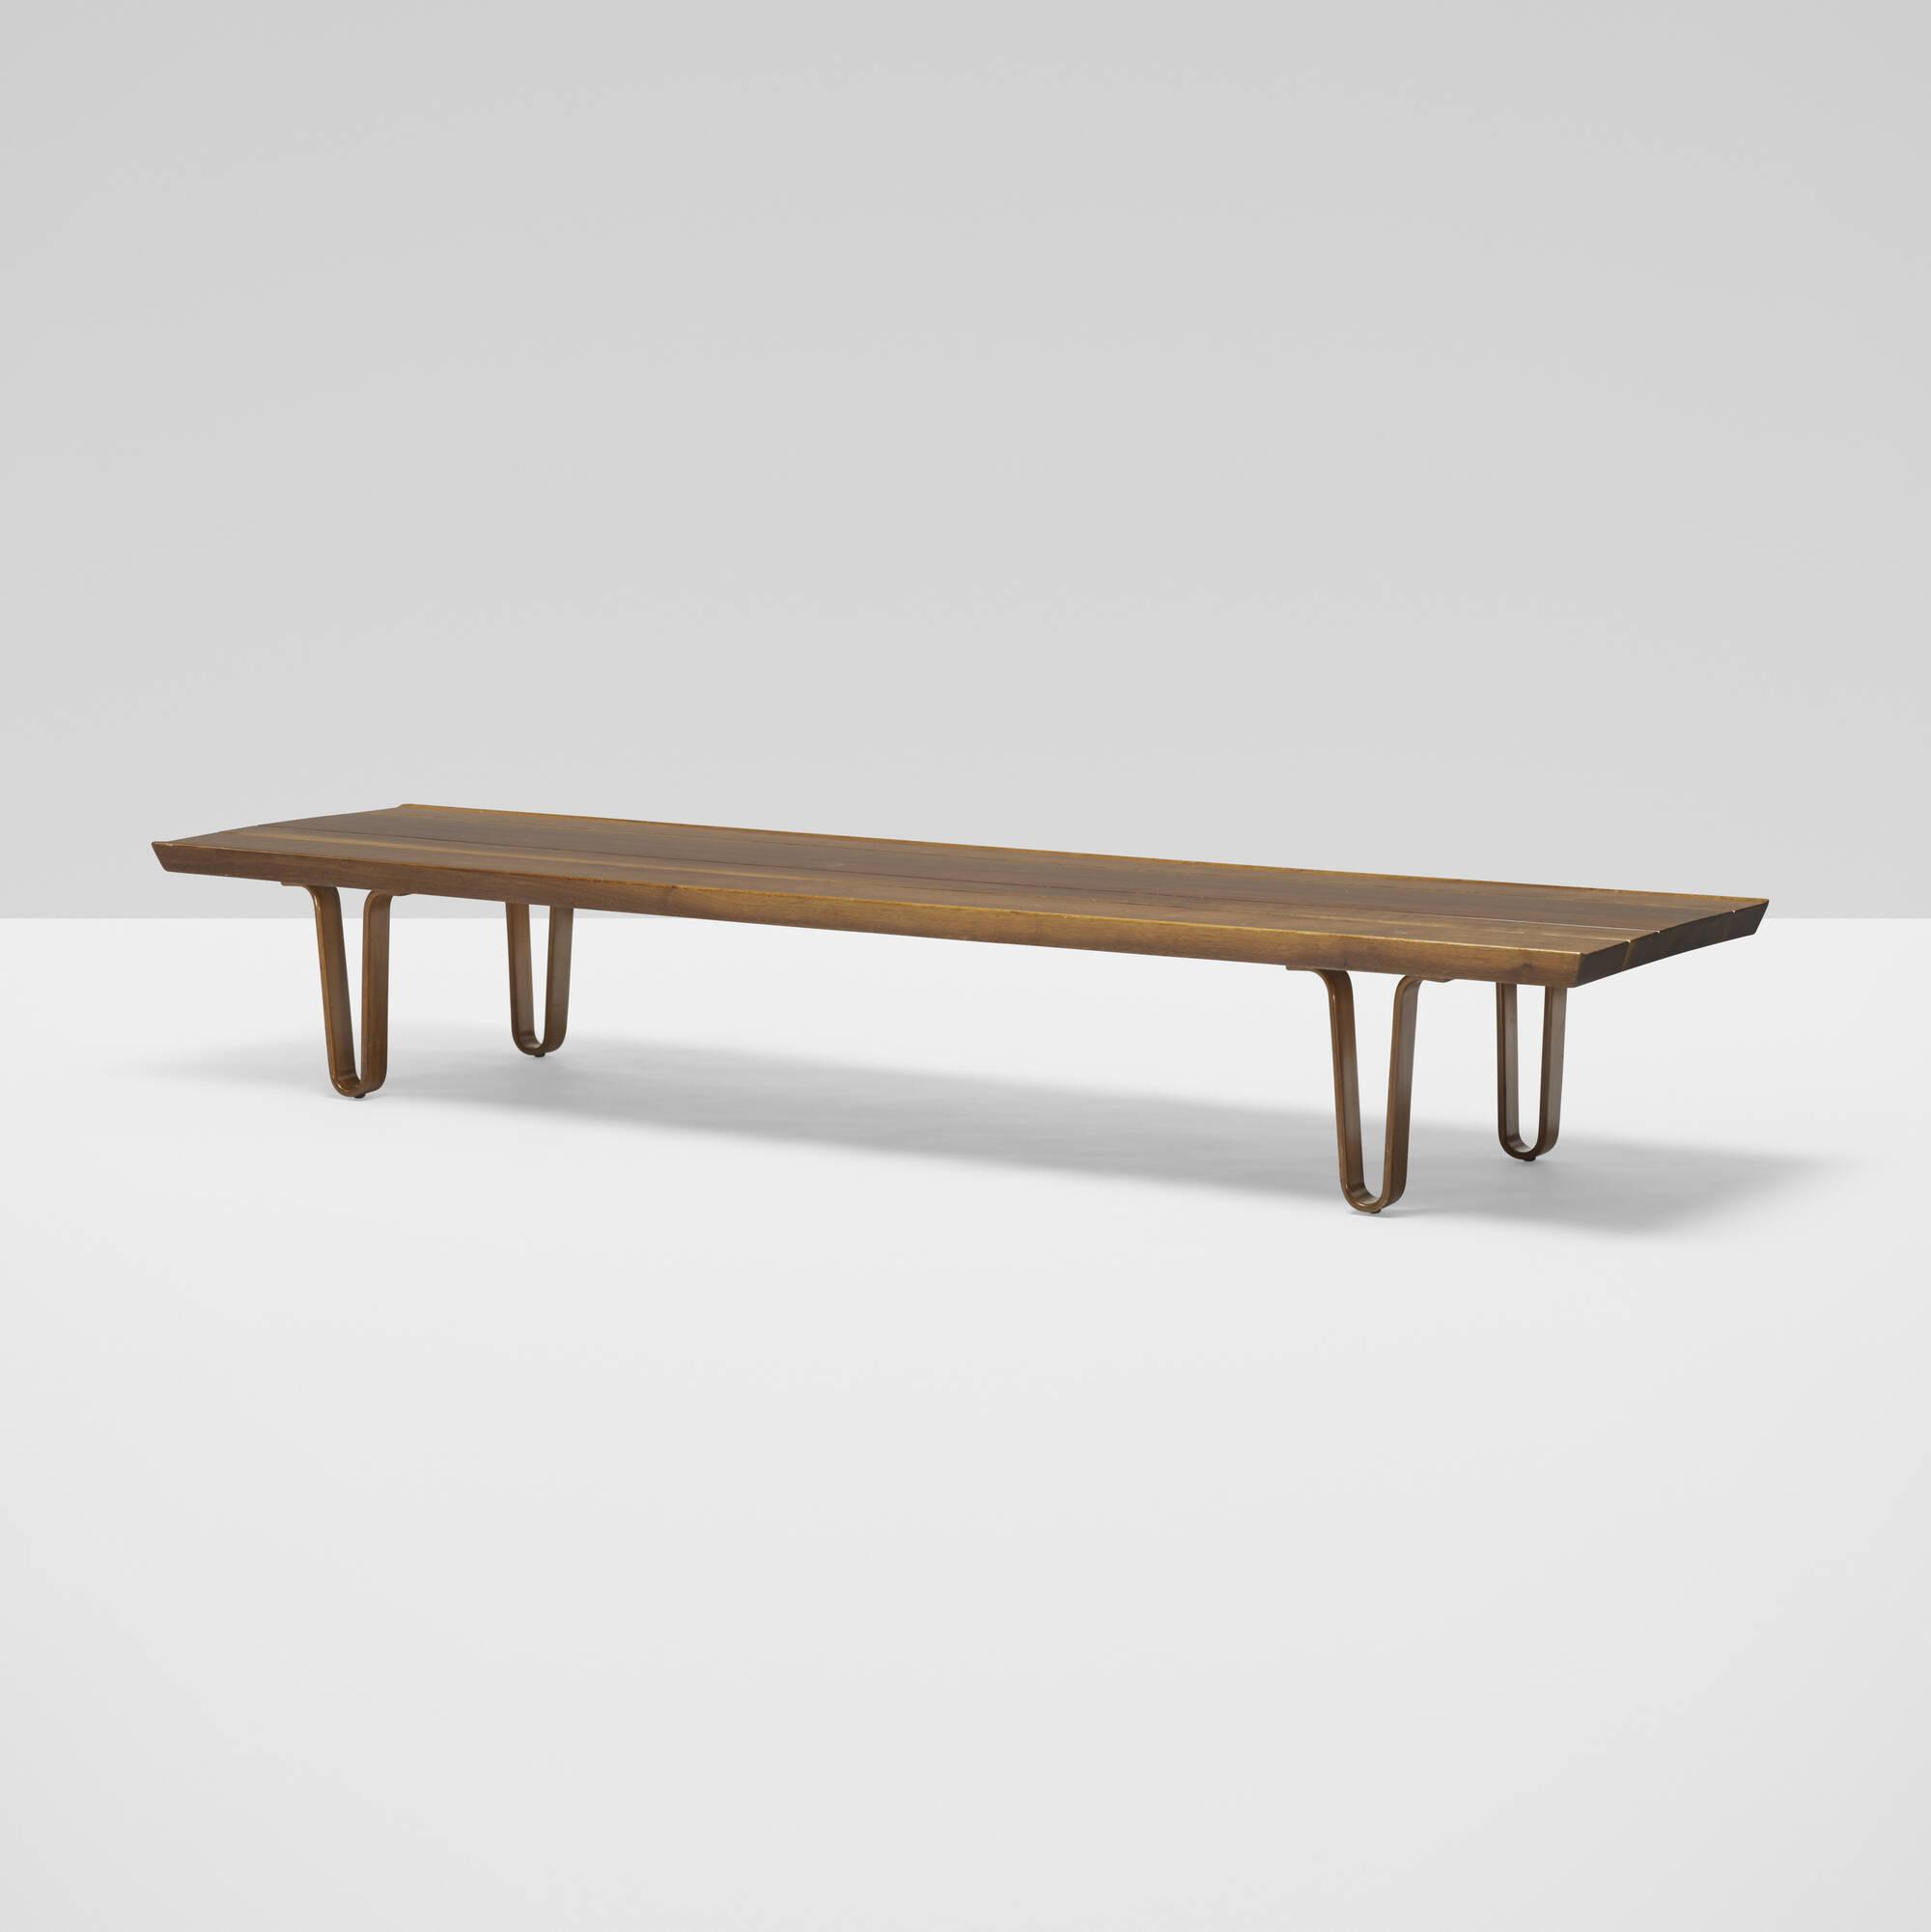 356: Edward Wormley / Long John coffee table (1 of 3)